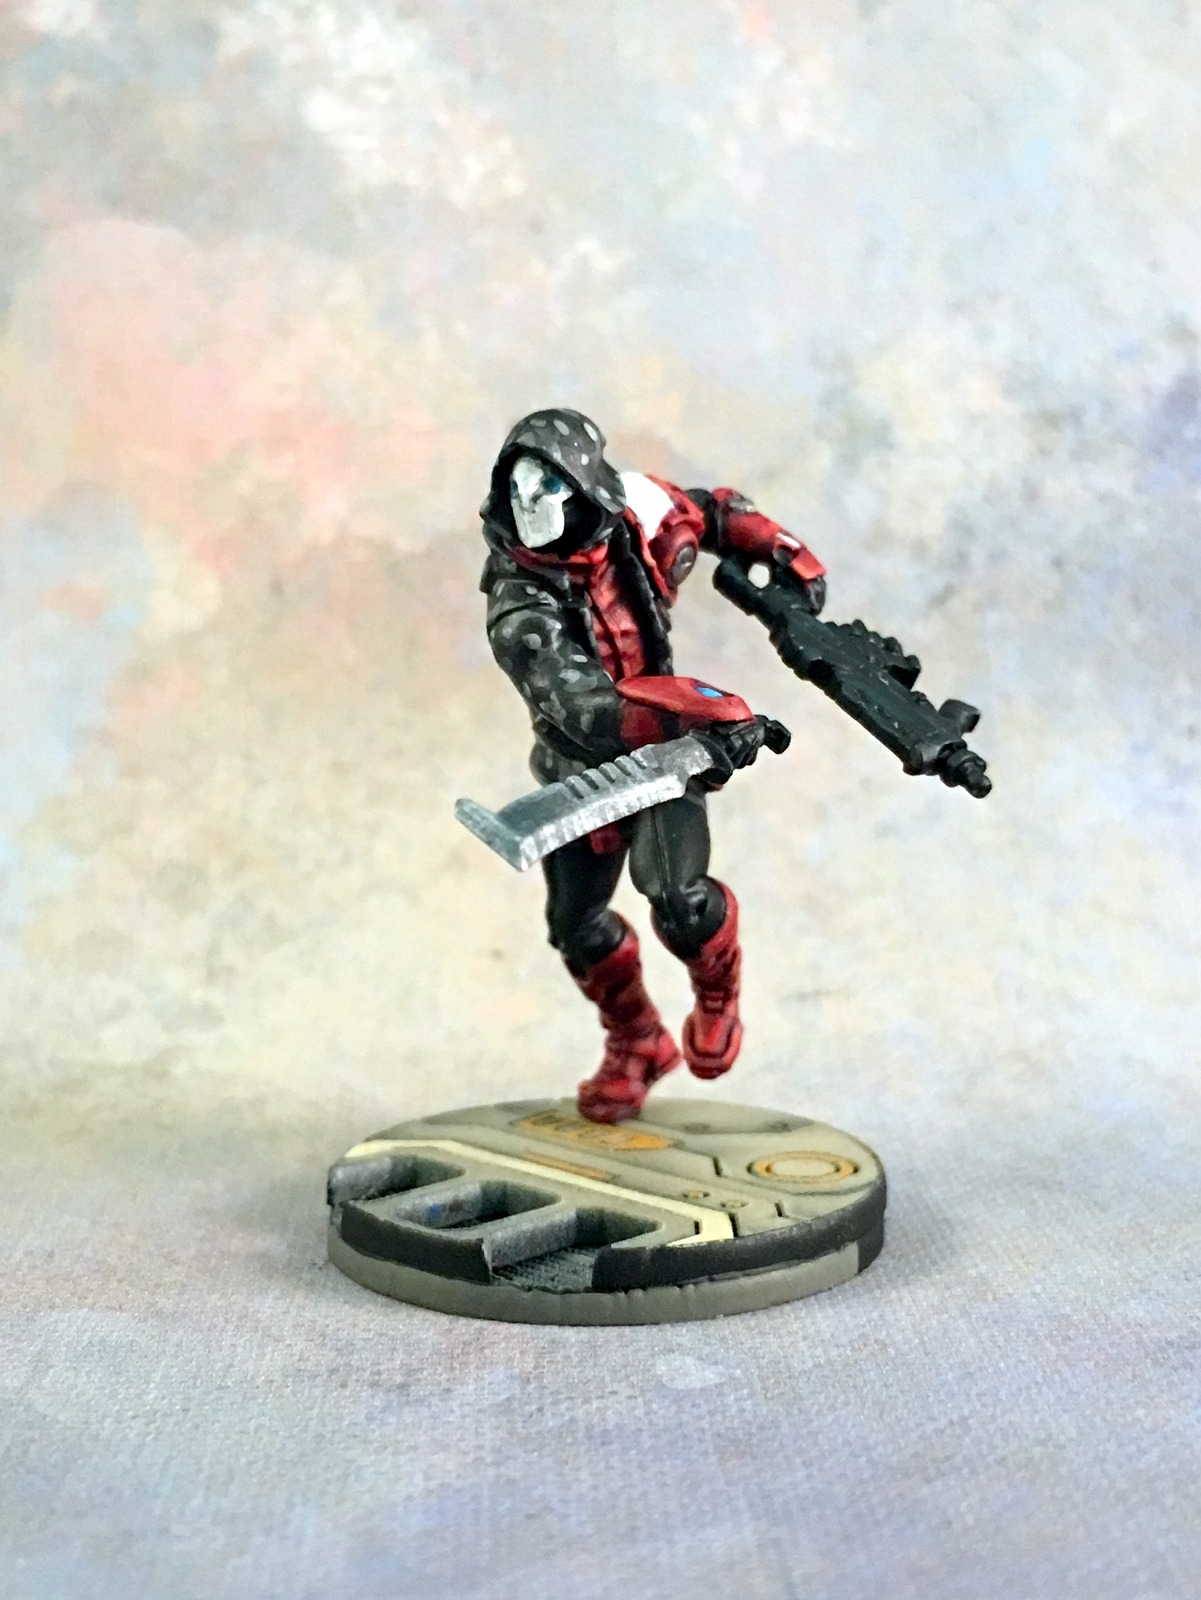 Infinity - Bandit Shotgun 1